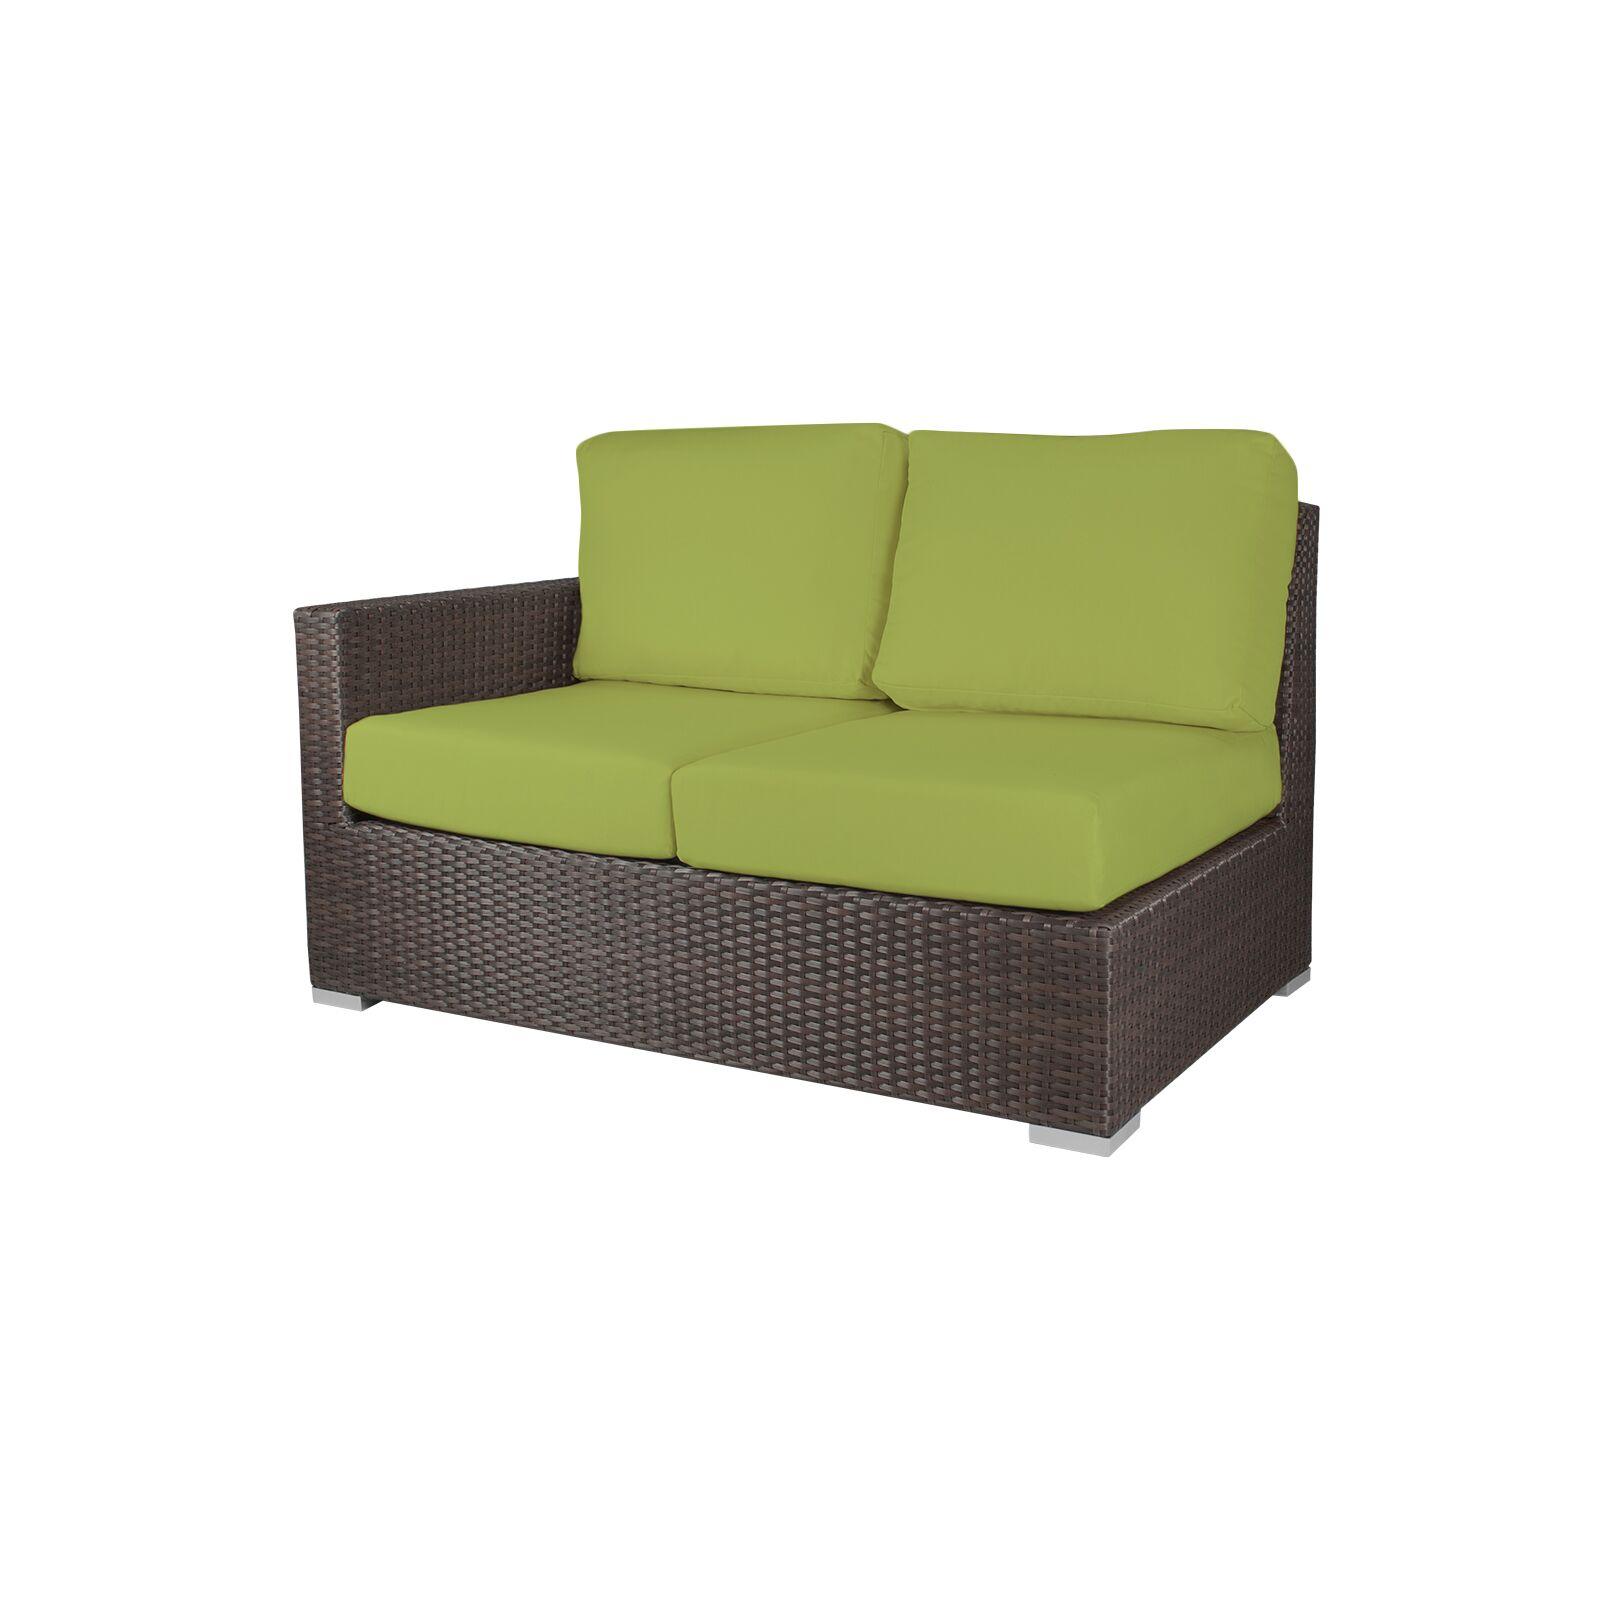 Ronning Patio Sofa with Cushions Fabric: Sunbrella Parrot